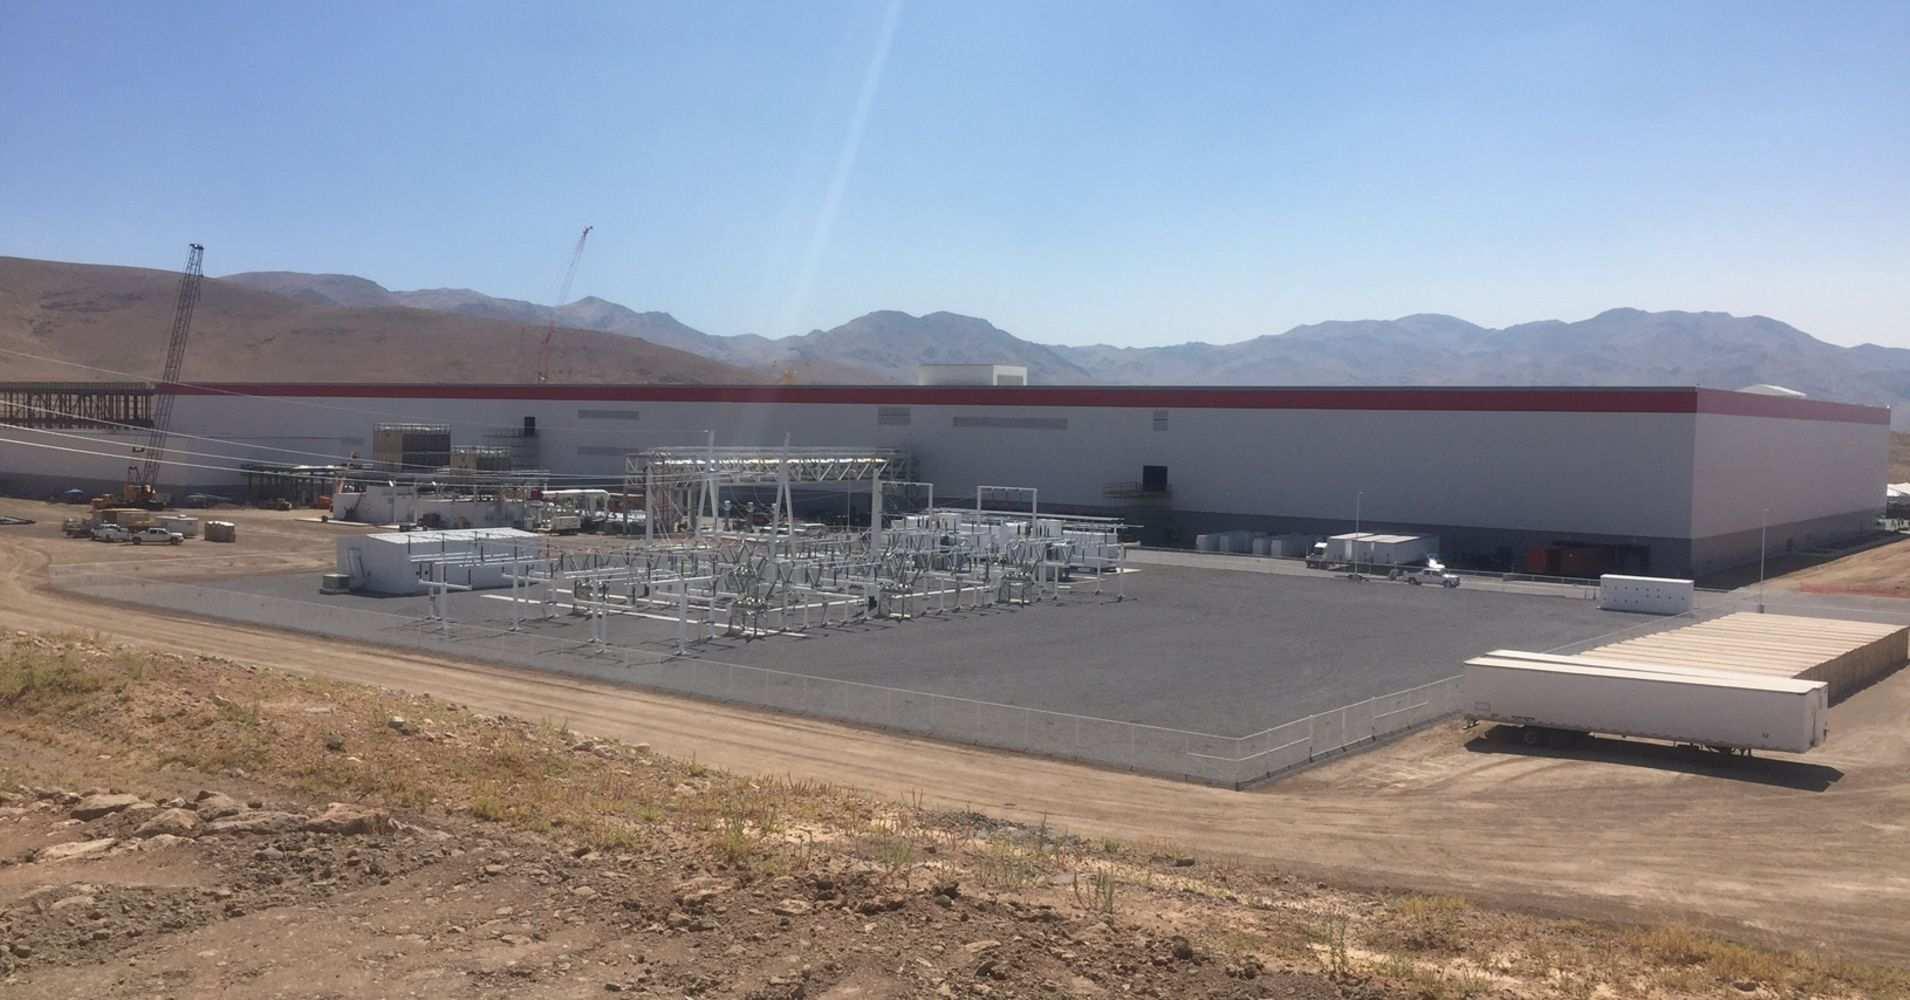 68 All New Tesla Gigafactory 2020 Photos by Tesla Gigafactory 2020